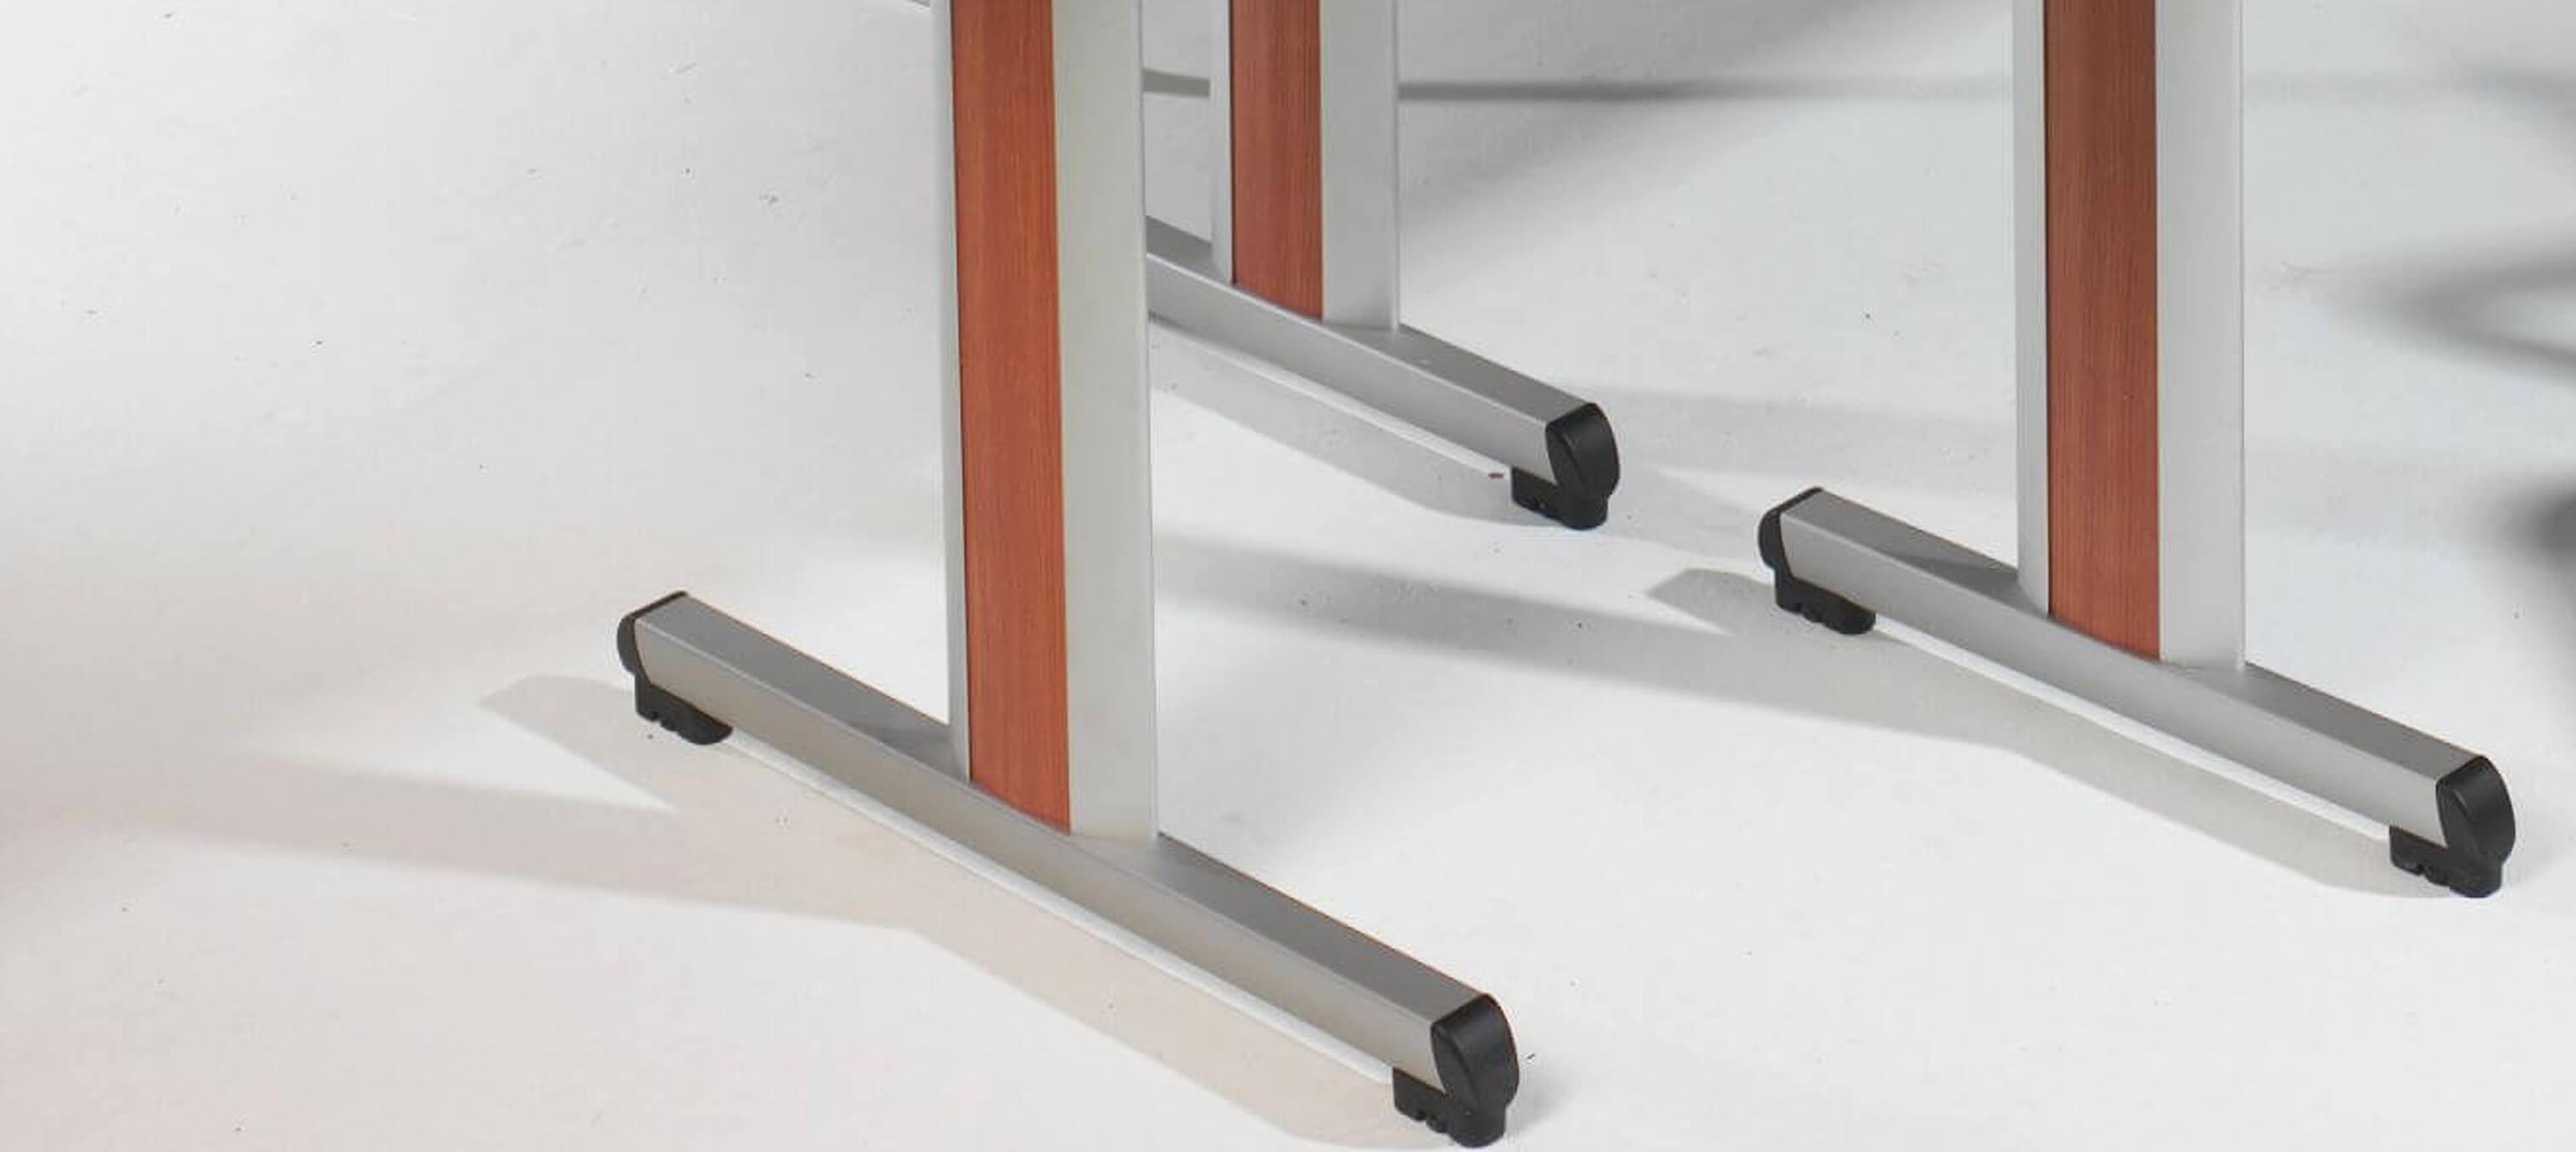 Configure 8 Office Legs